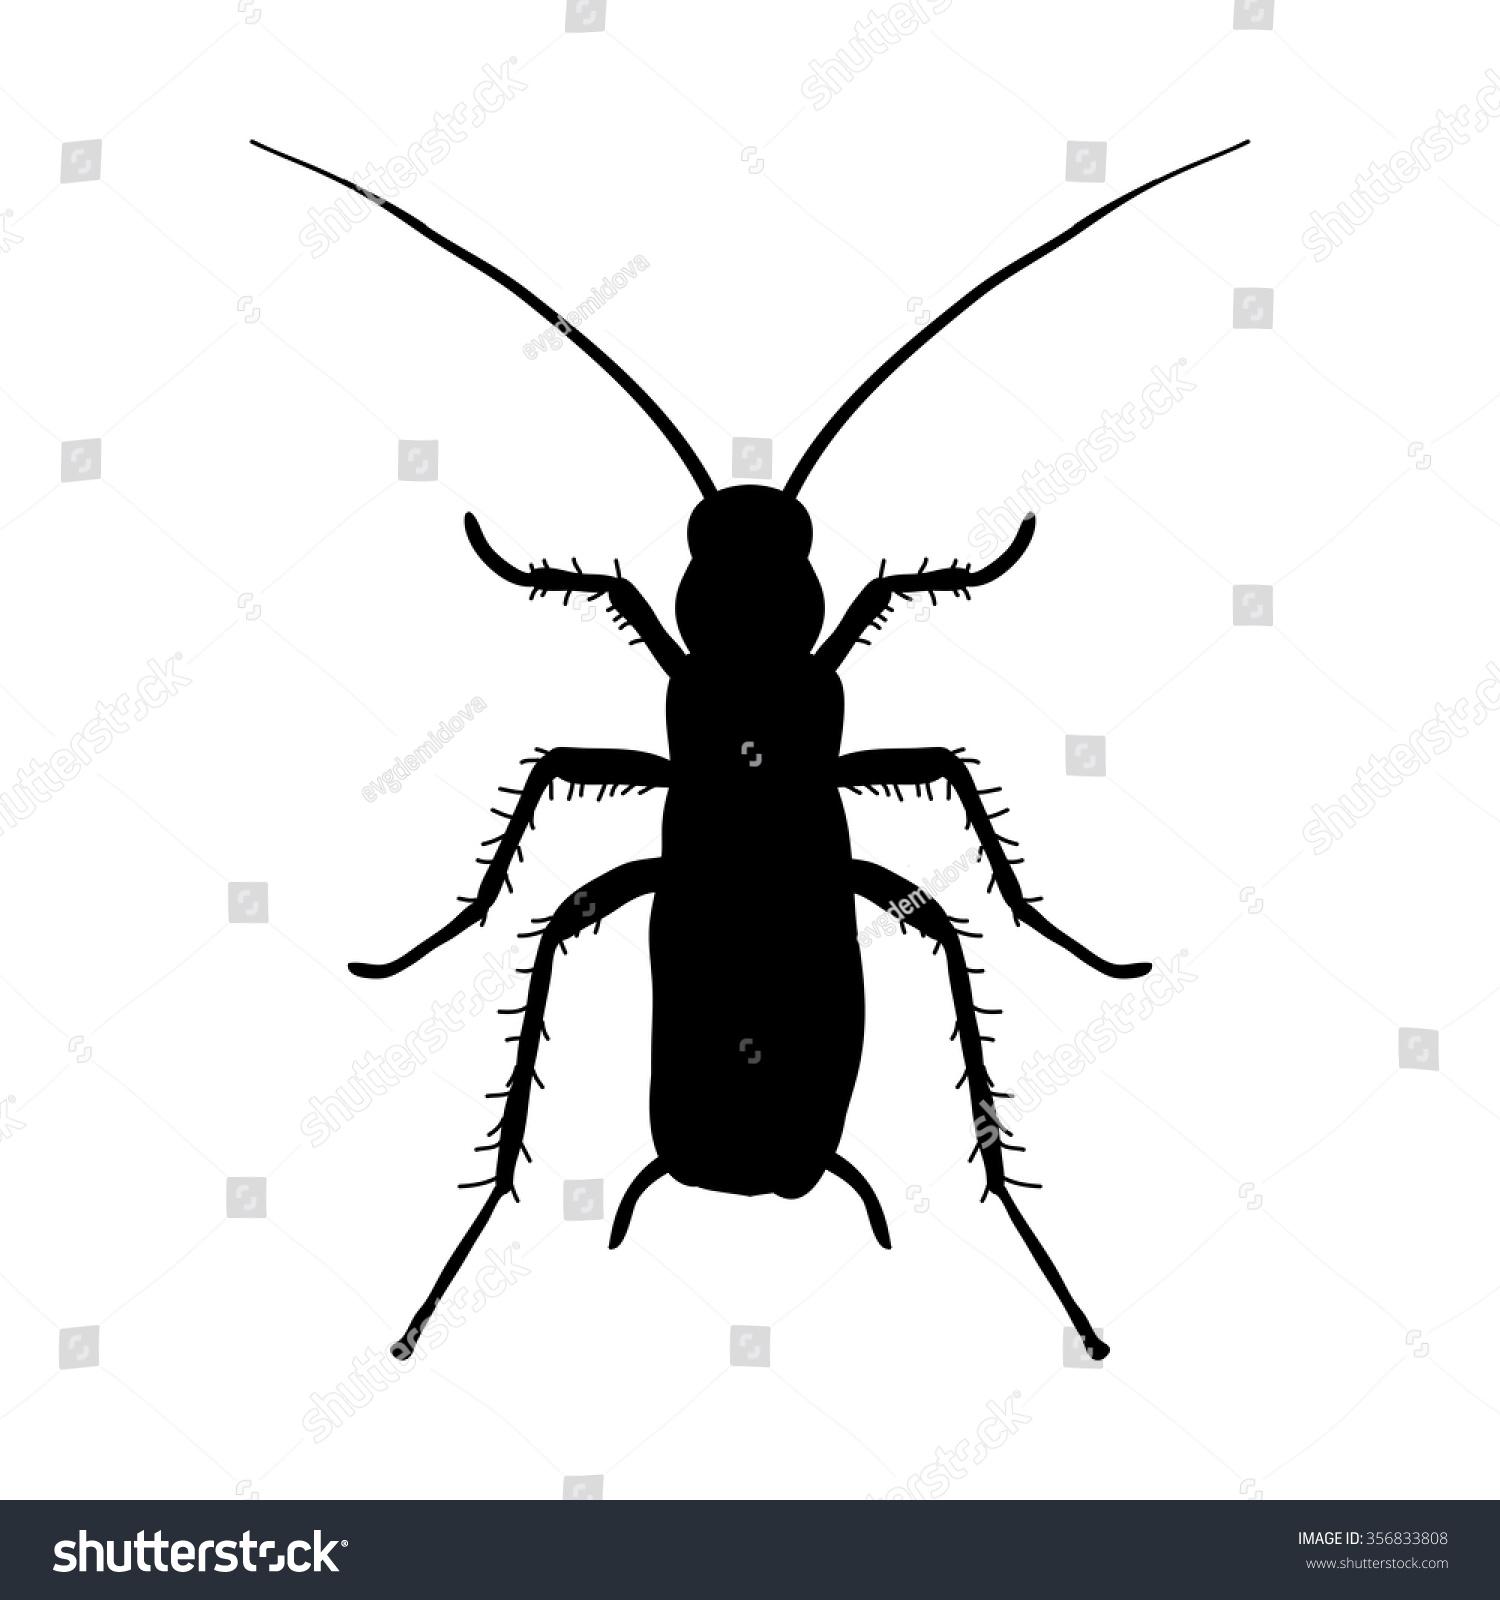 Silhouette Cockroach Blattella Germanica Cockroach Sketch Stock